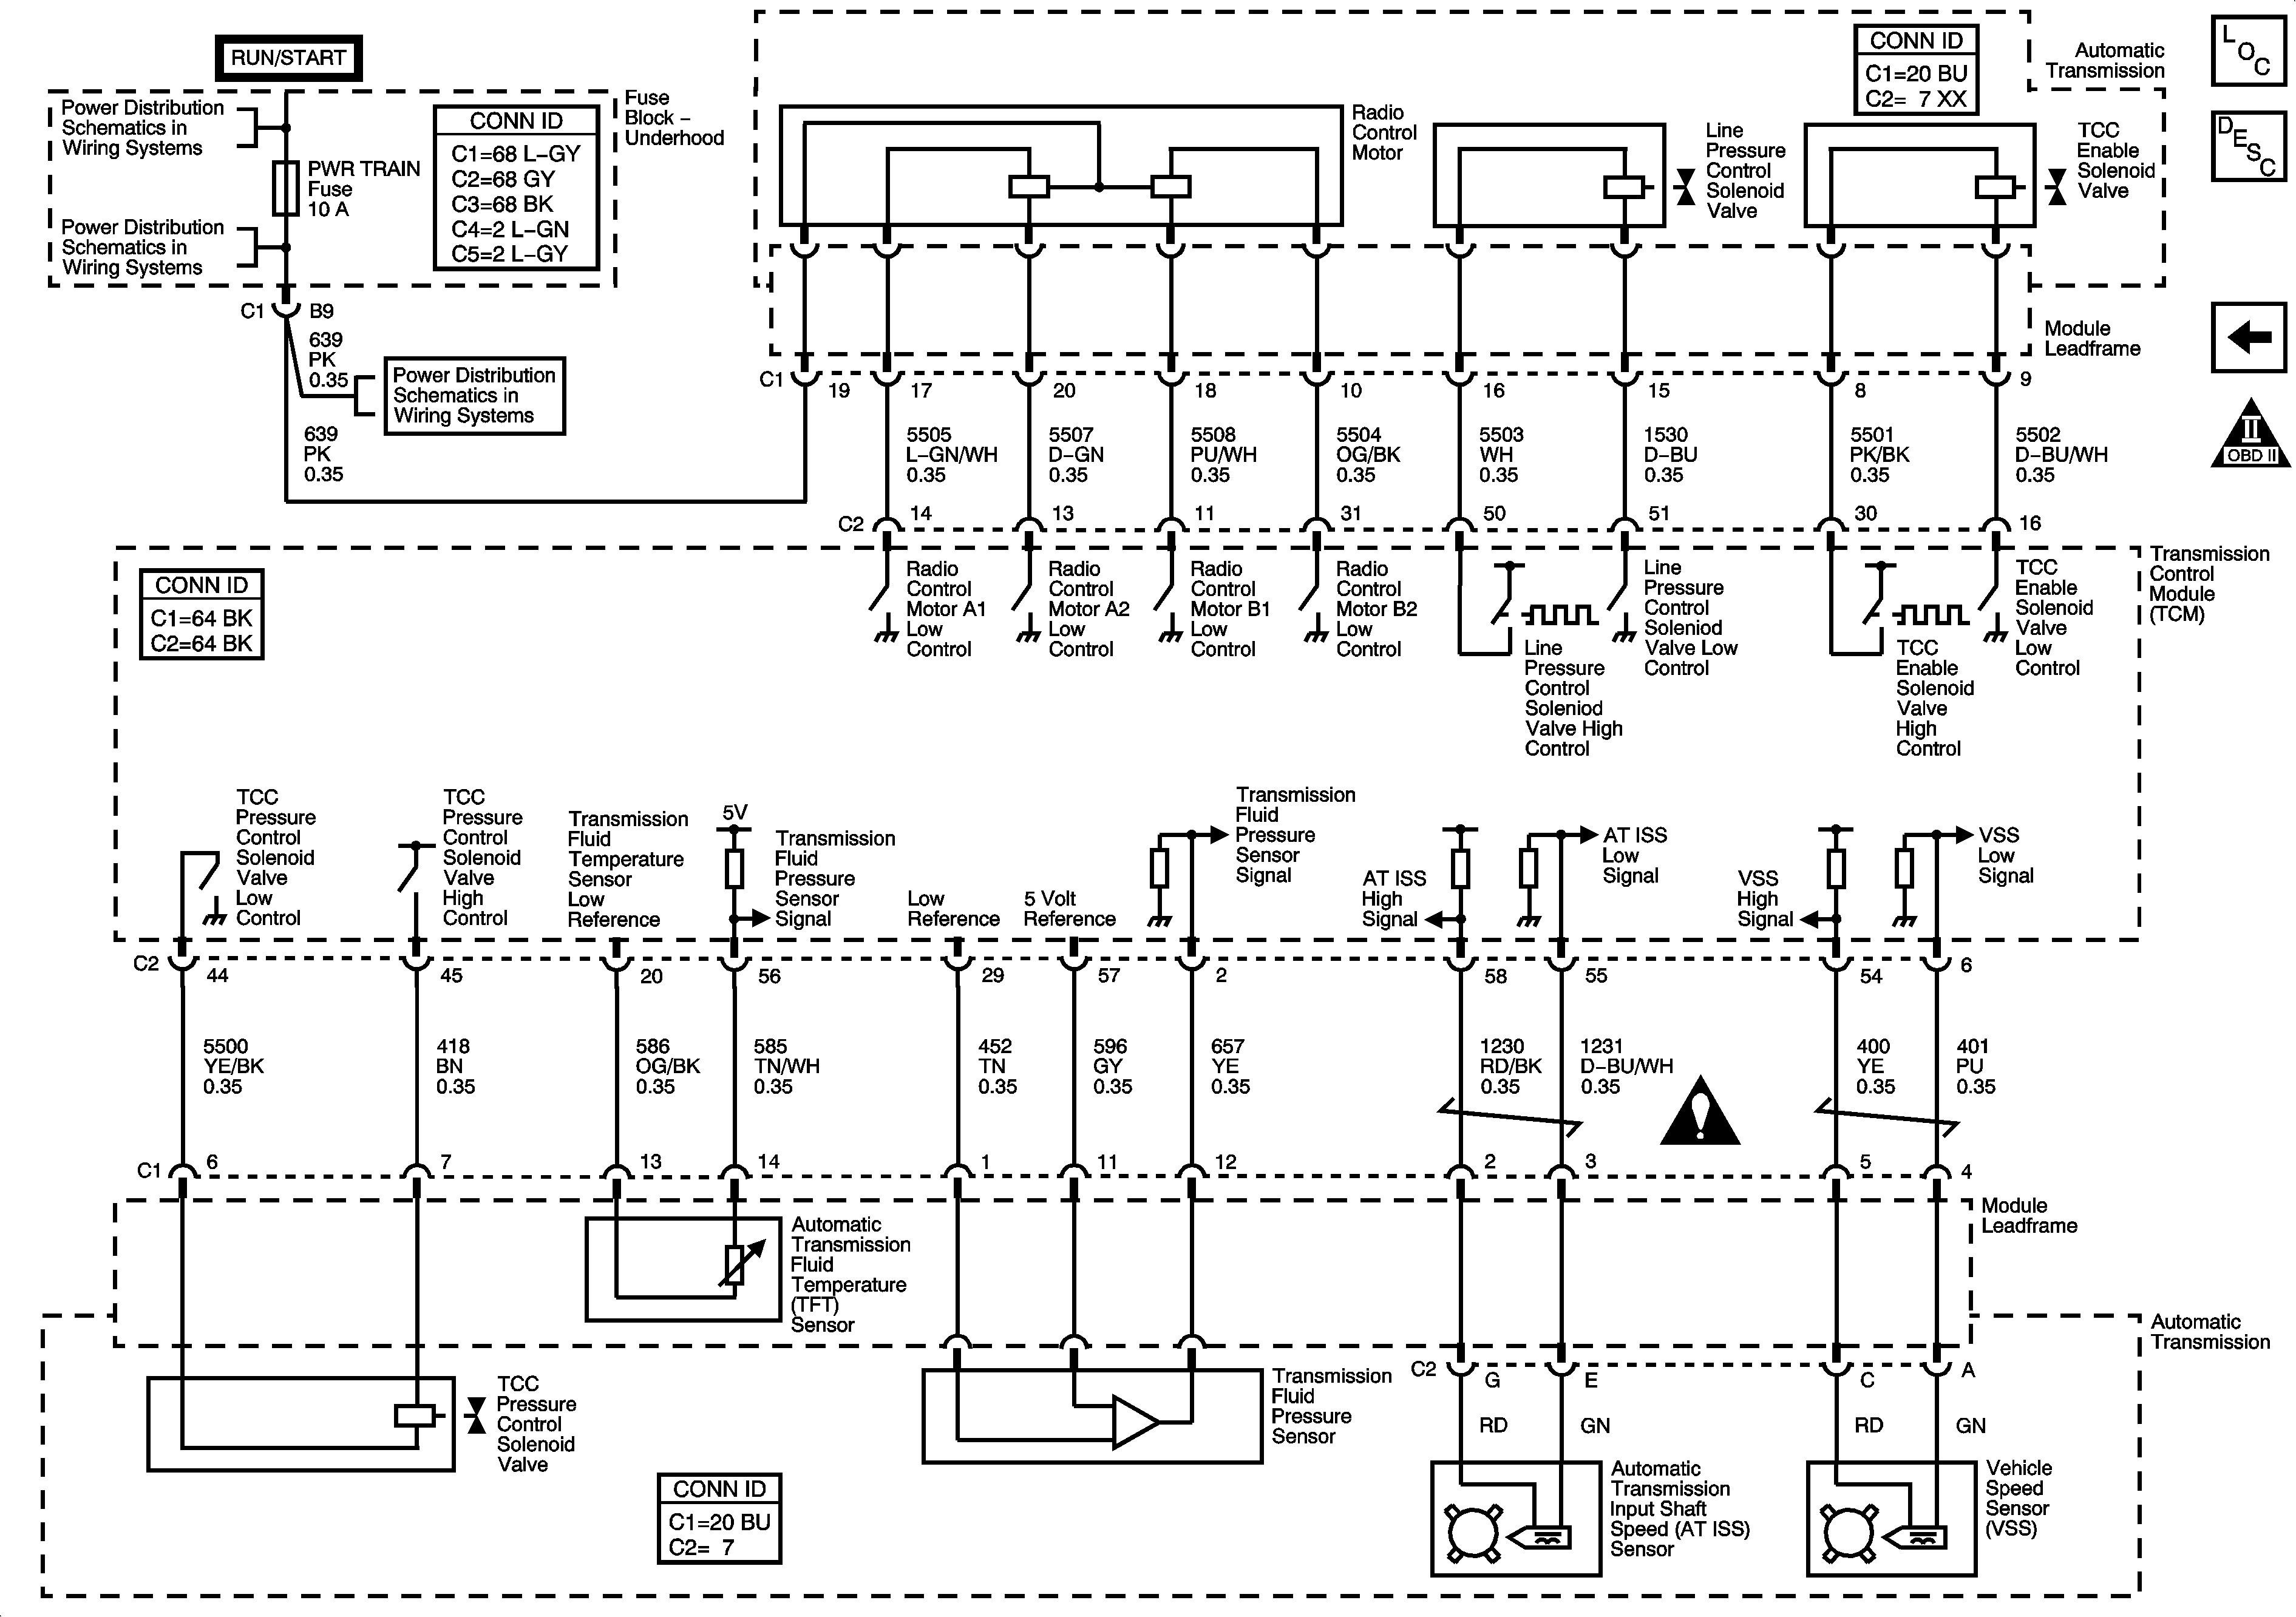 1997 Saturn Sl1 Engine Diagram 2001 Saturn Sl1 Transmission Diagram Wiring  Library Of 1997 Saturn Sl1